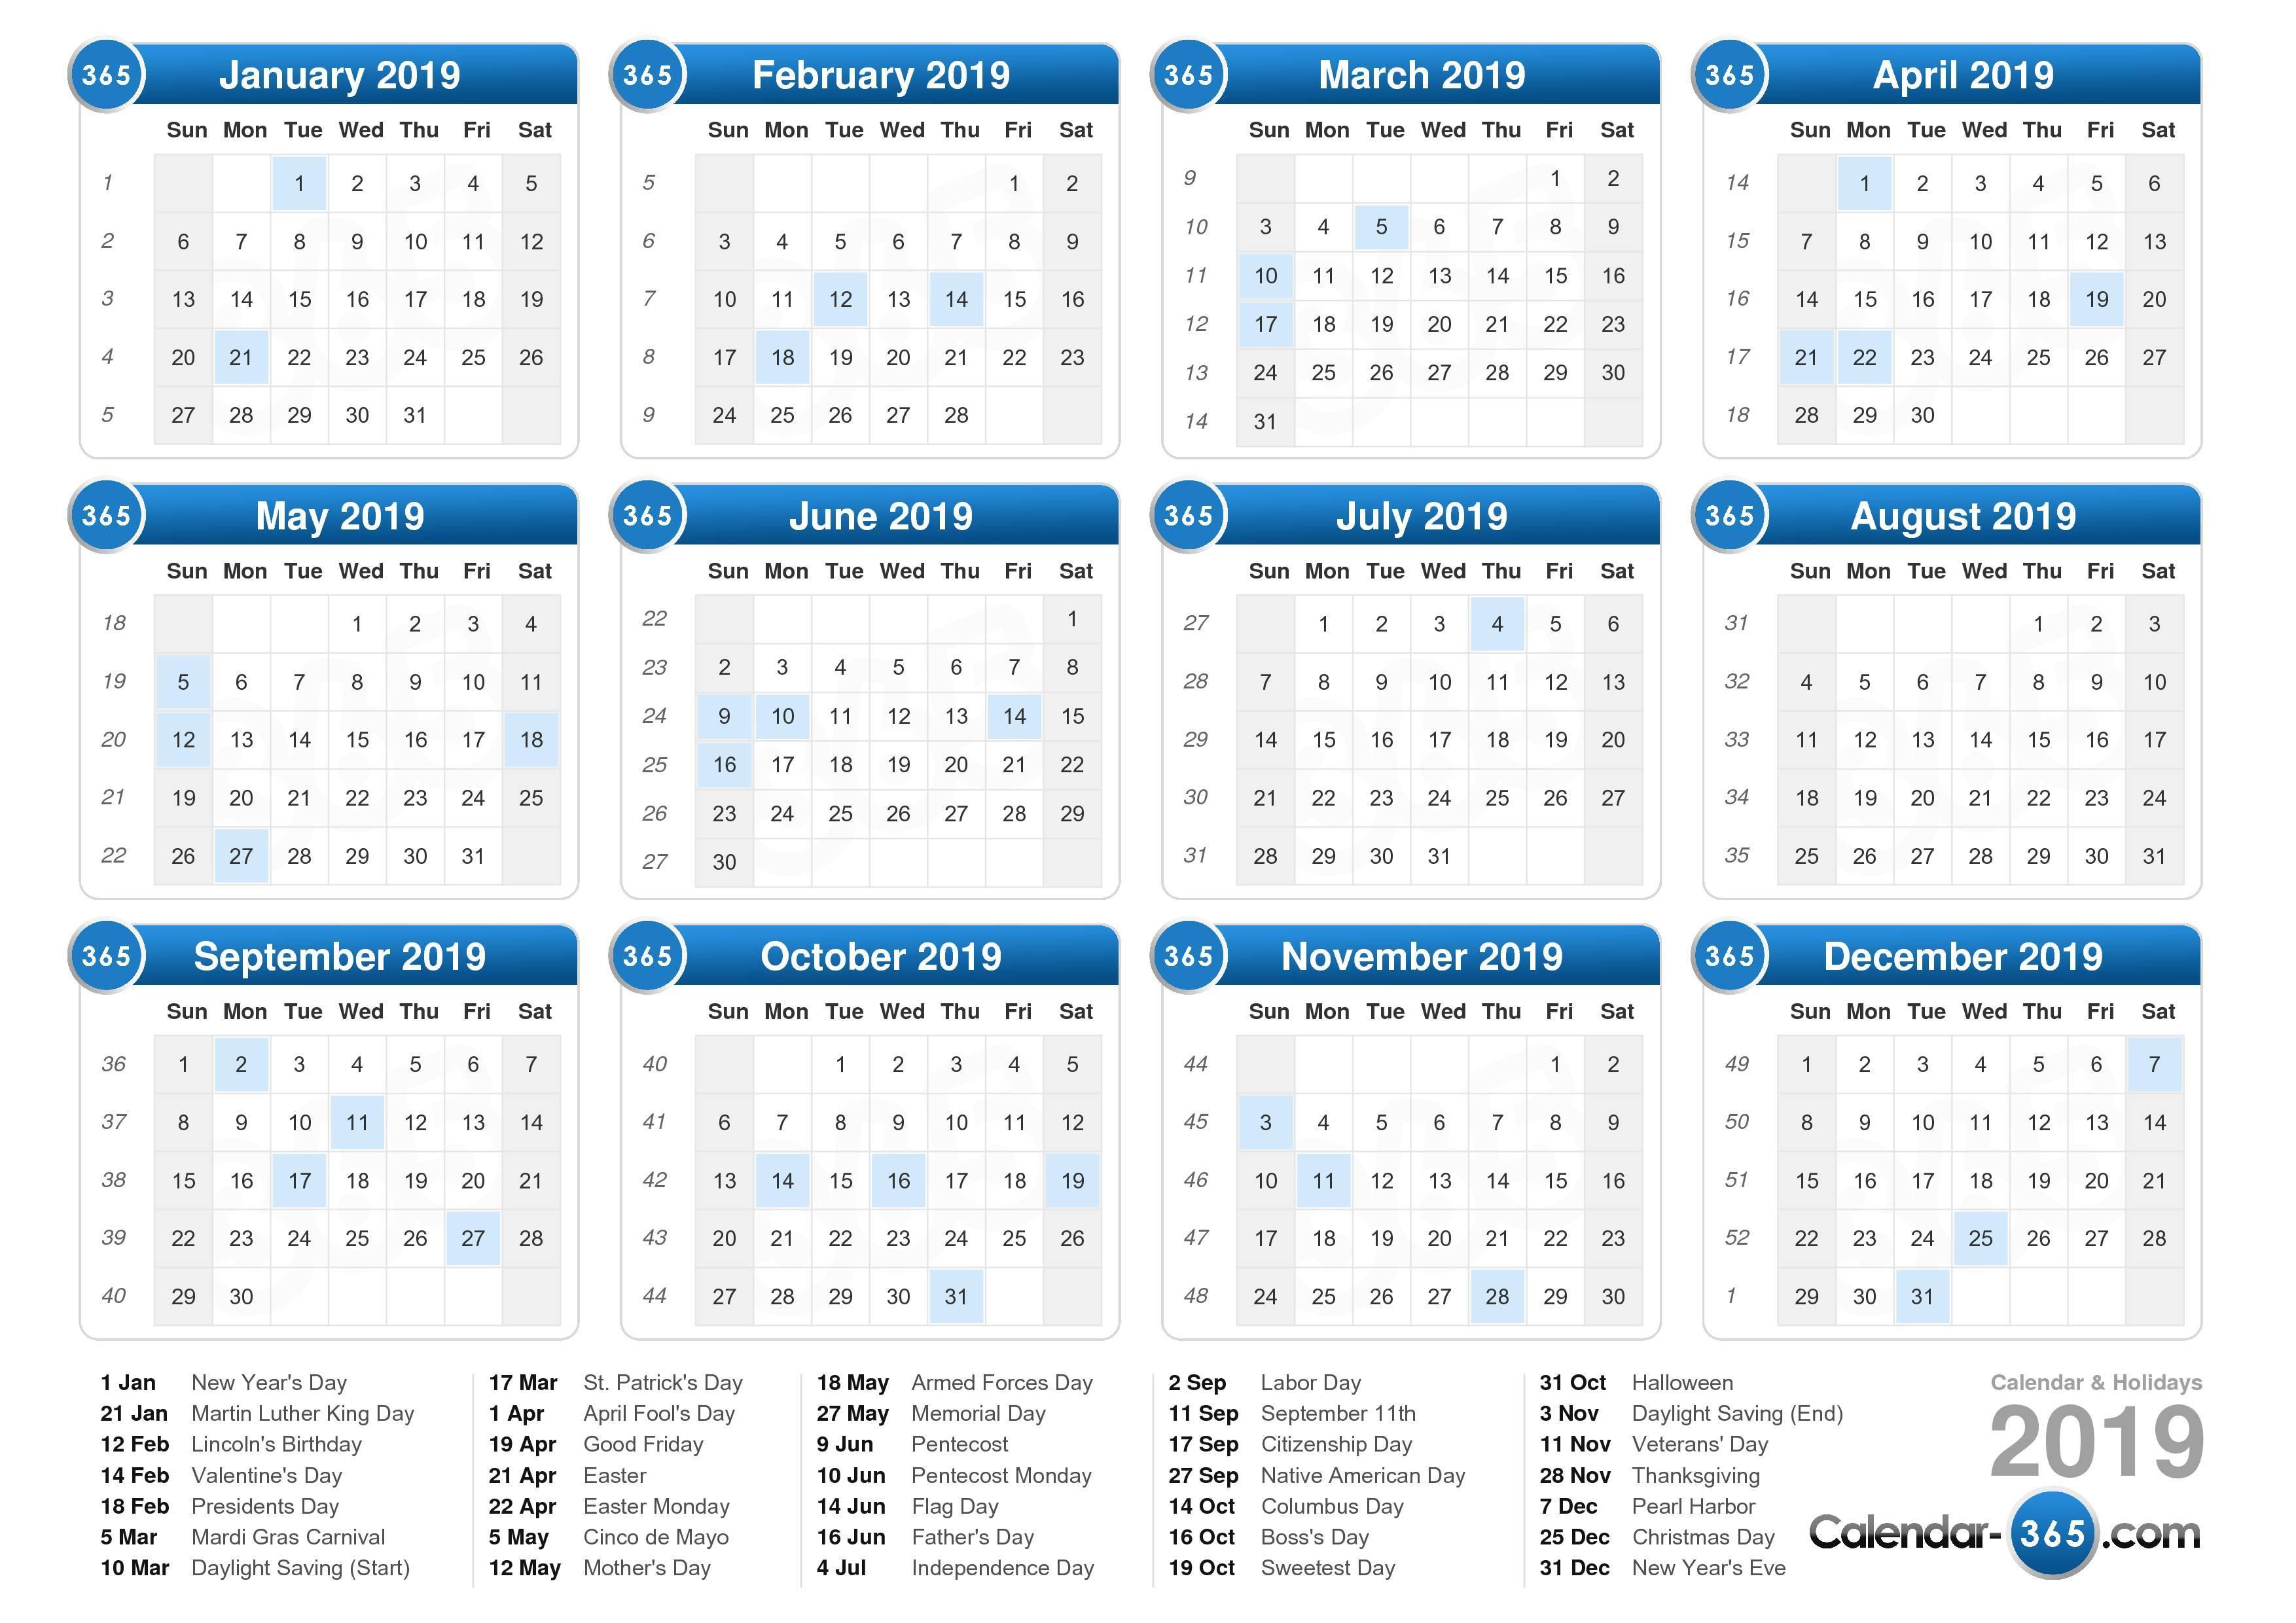 2019 Calendar inside 2019-2020 Calendar Financial Week Numbers